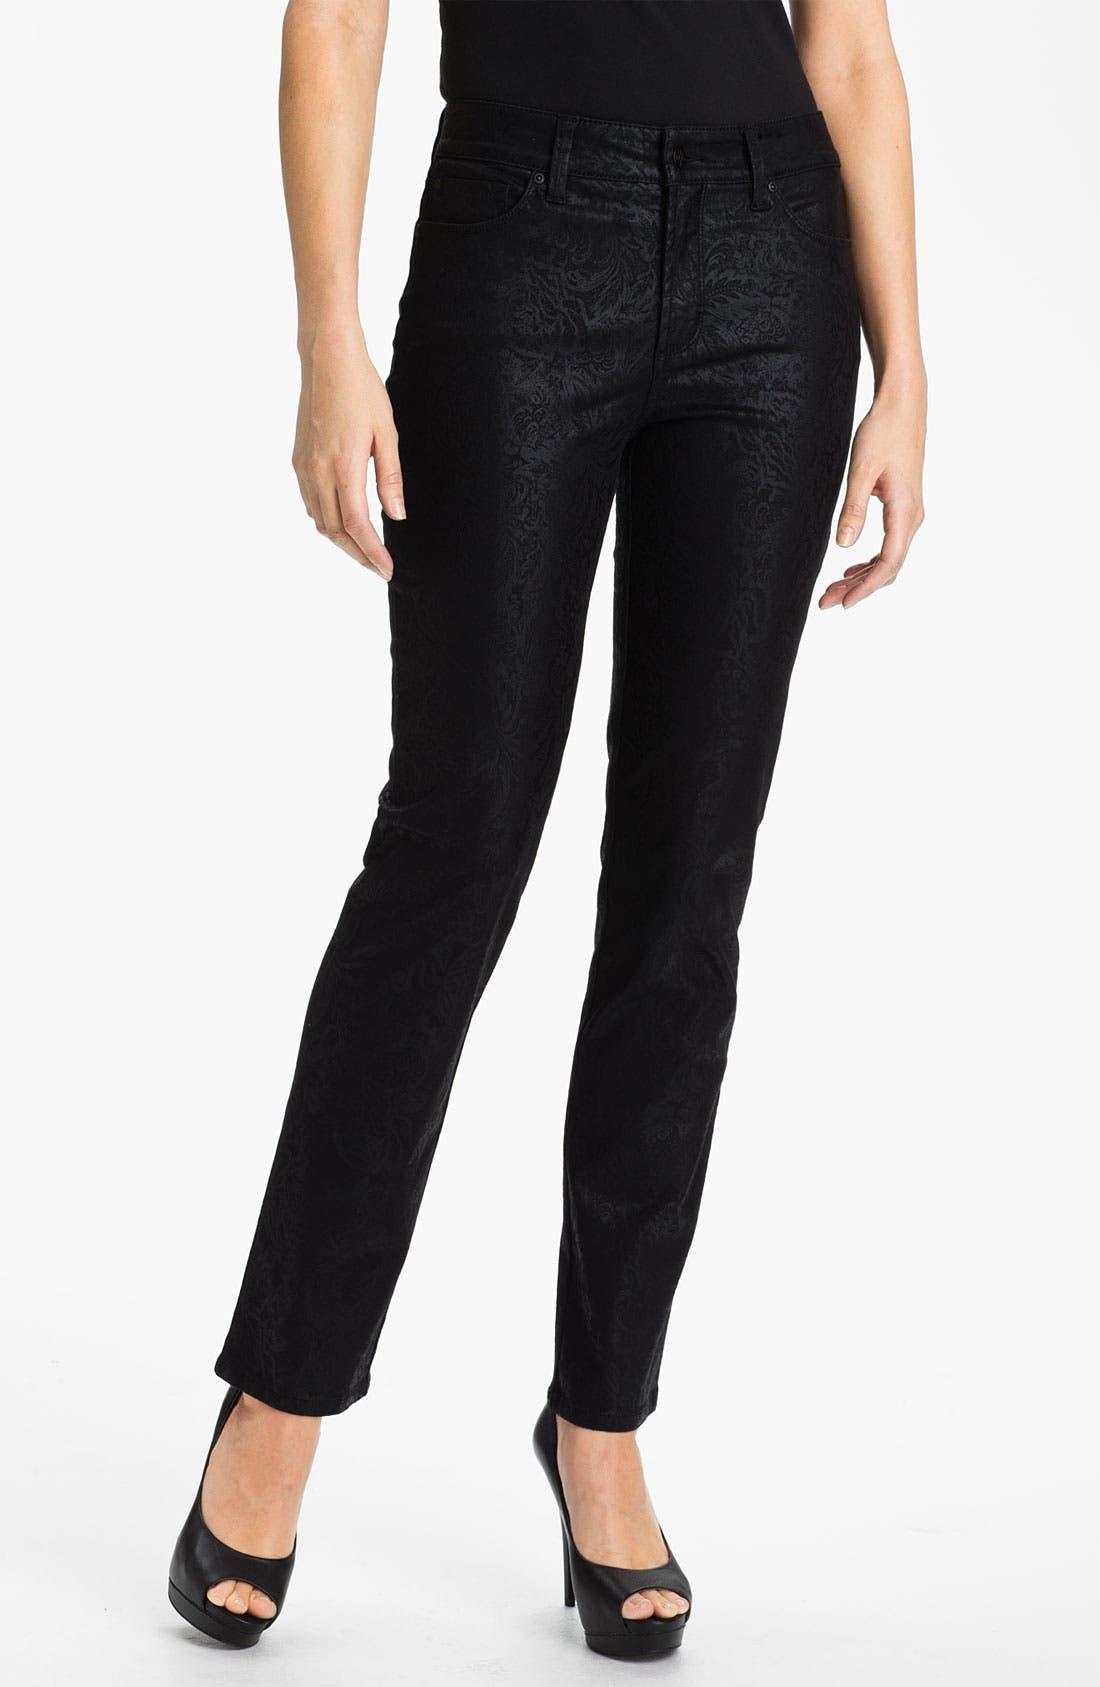 Main Image - NYDJ 'Sheri - Metallic Gilded Lily' Twill Skinny Jeans (Petite)